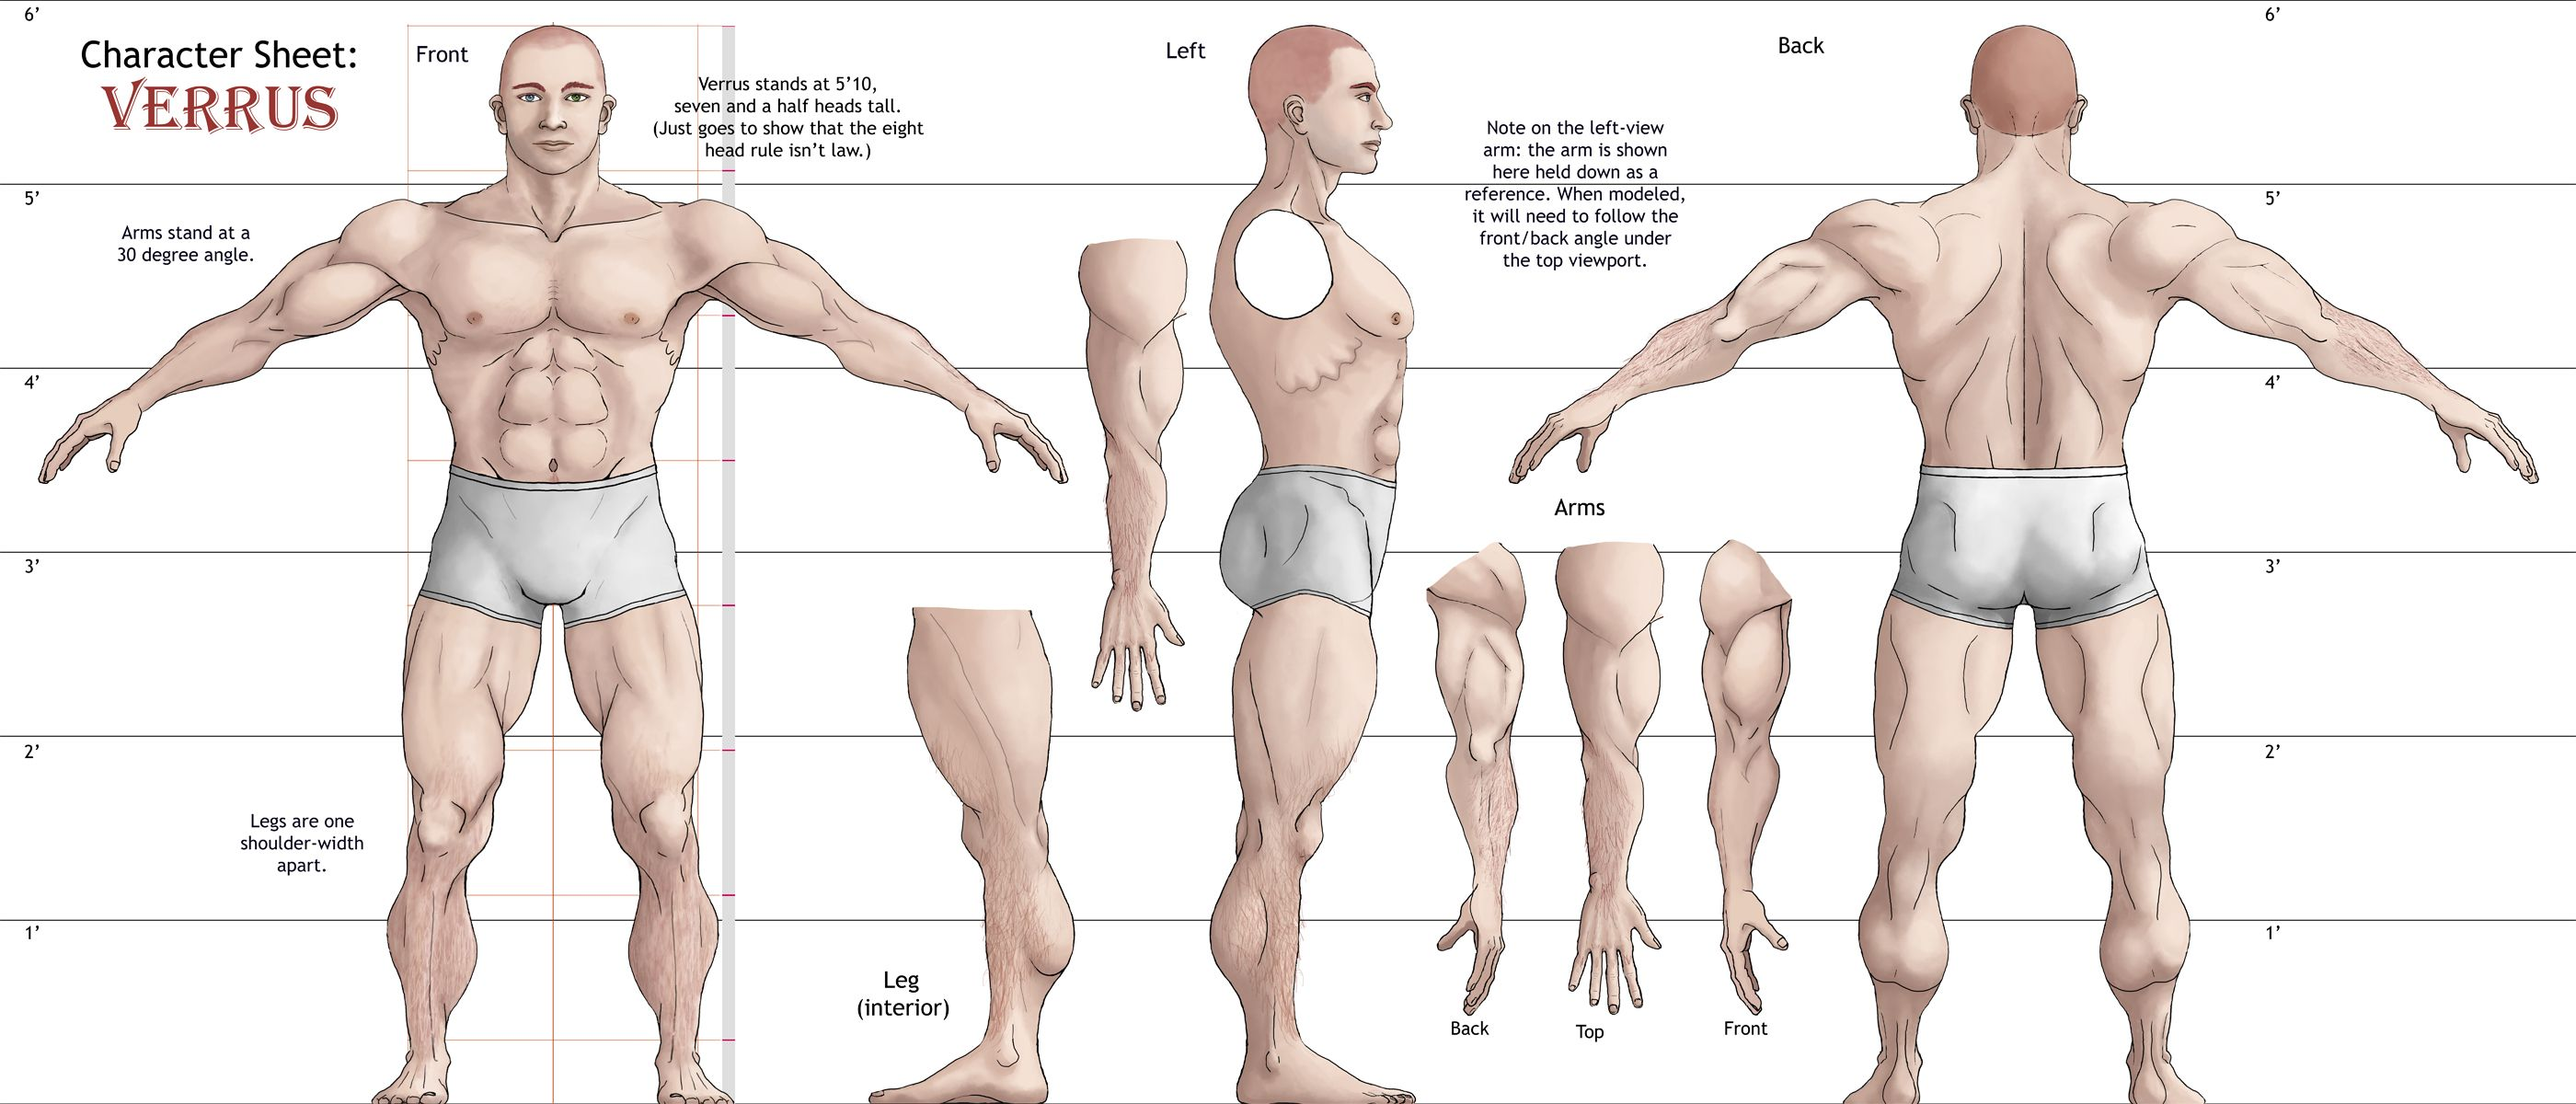 verrus, 3d reference sheet by ~elizawyatt on deviantart, Muscles